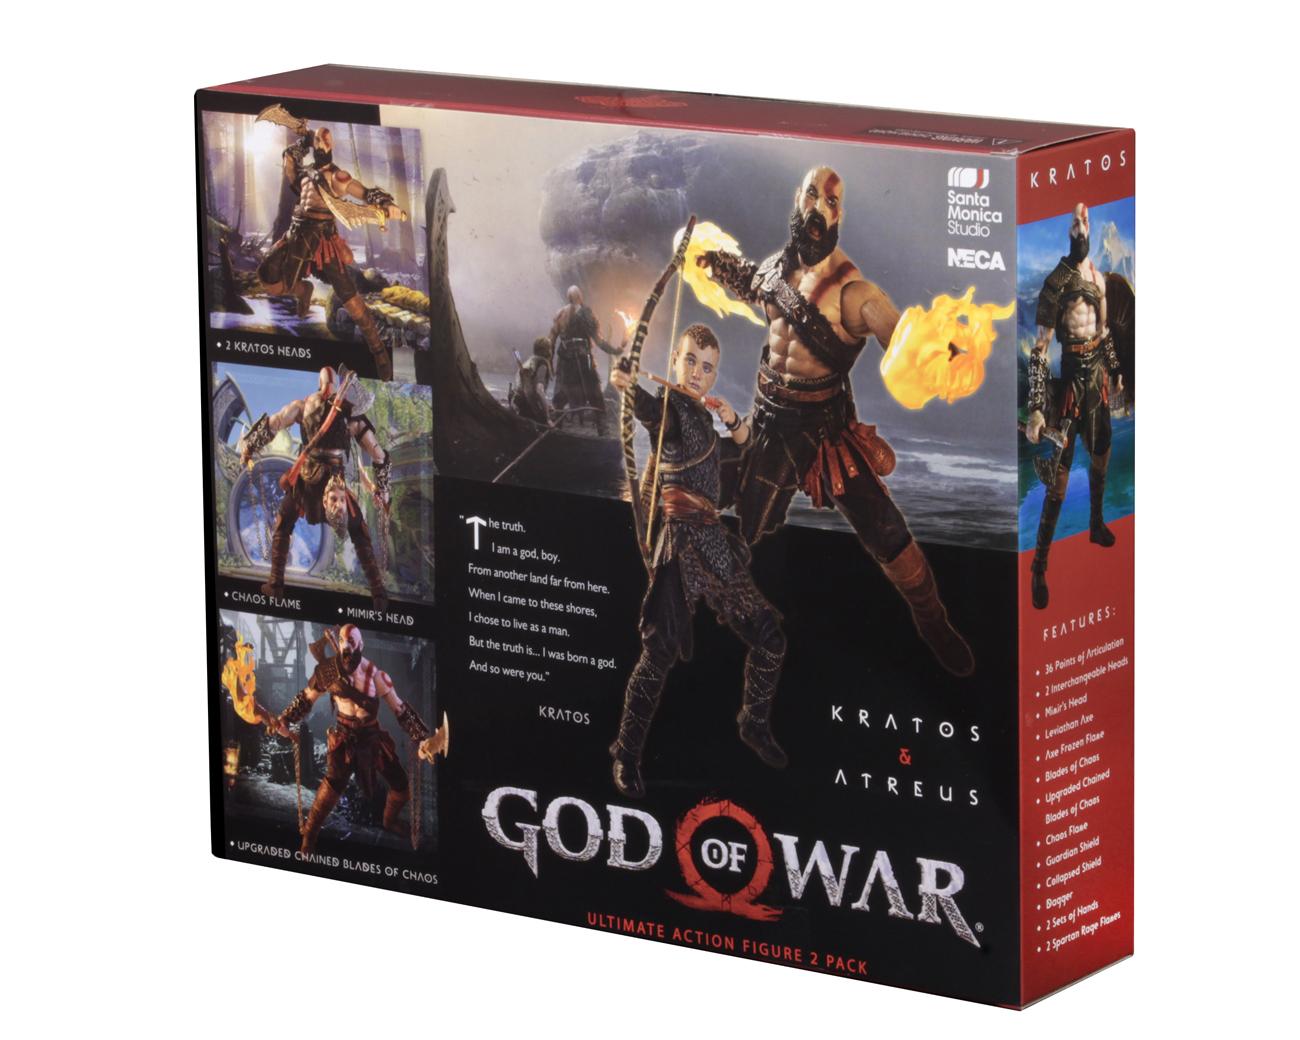 God Of War 2018 7 Scale Action Figure Ultimate Kratos Atreus 2 Pack Necaonline Com